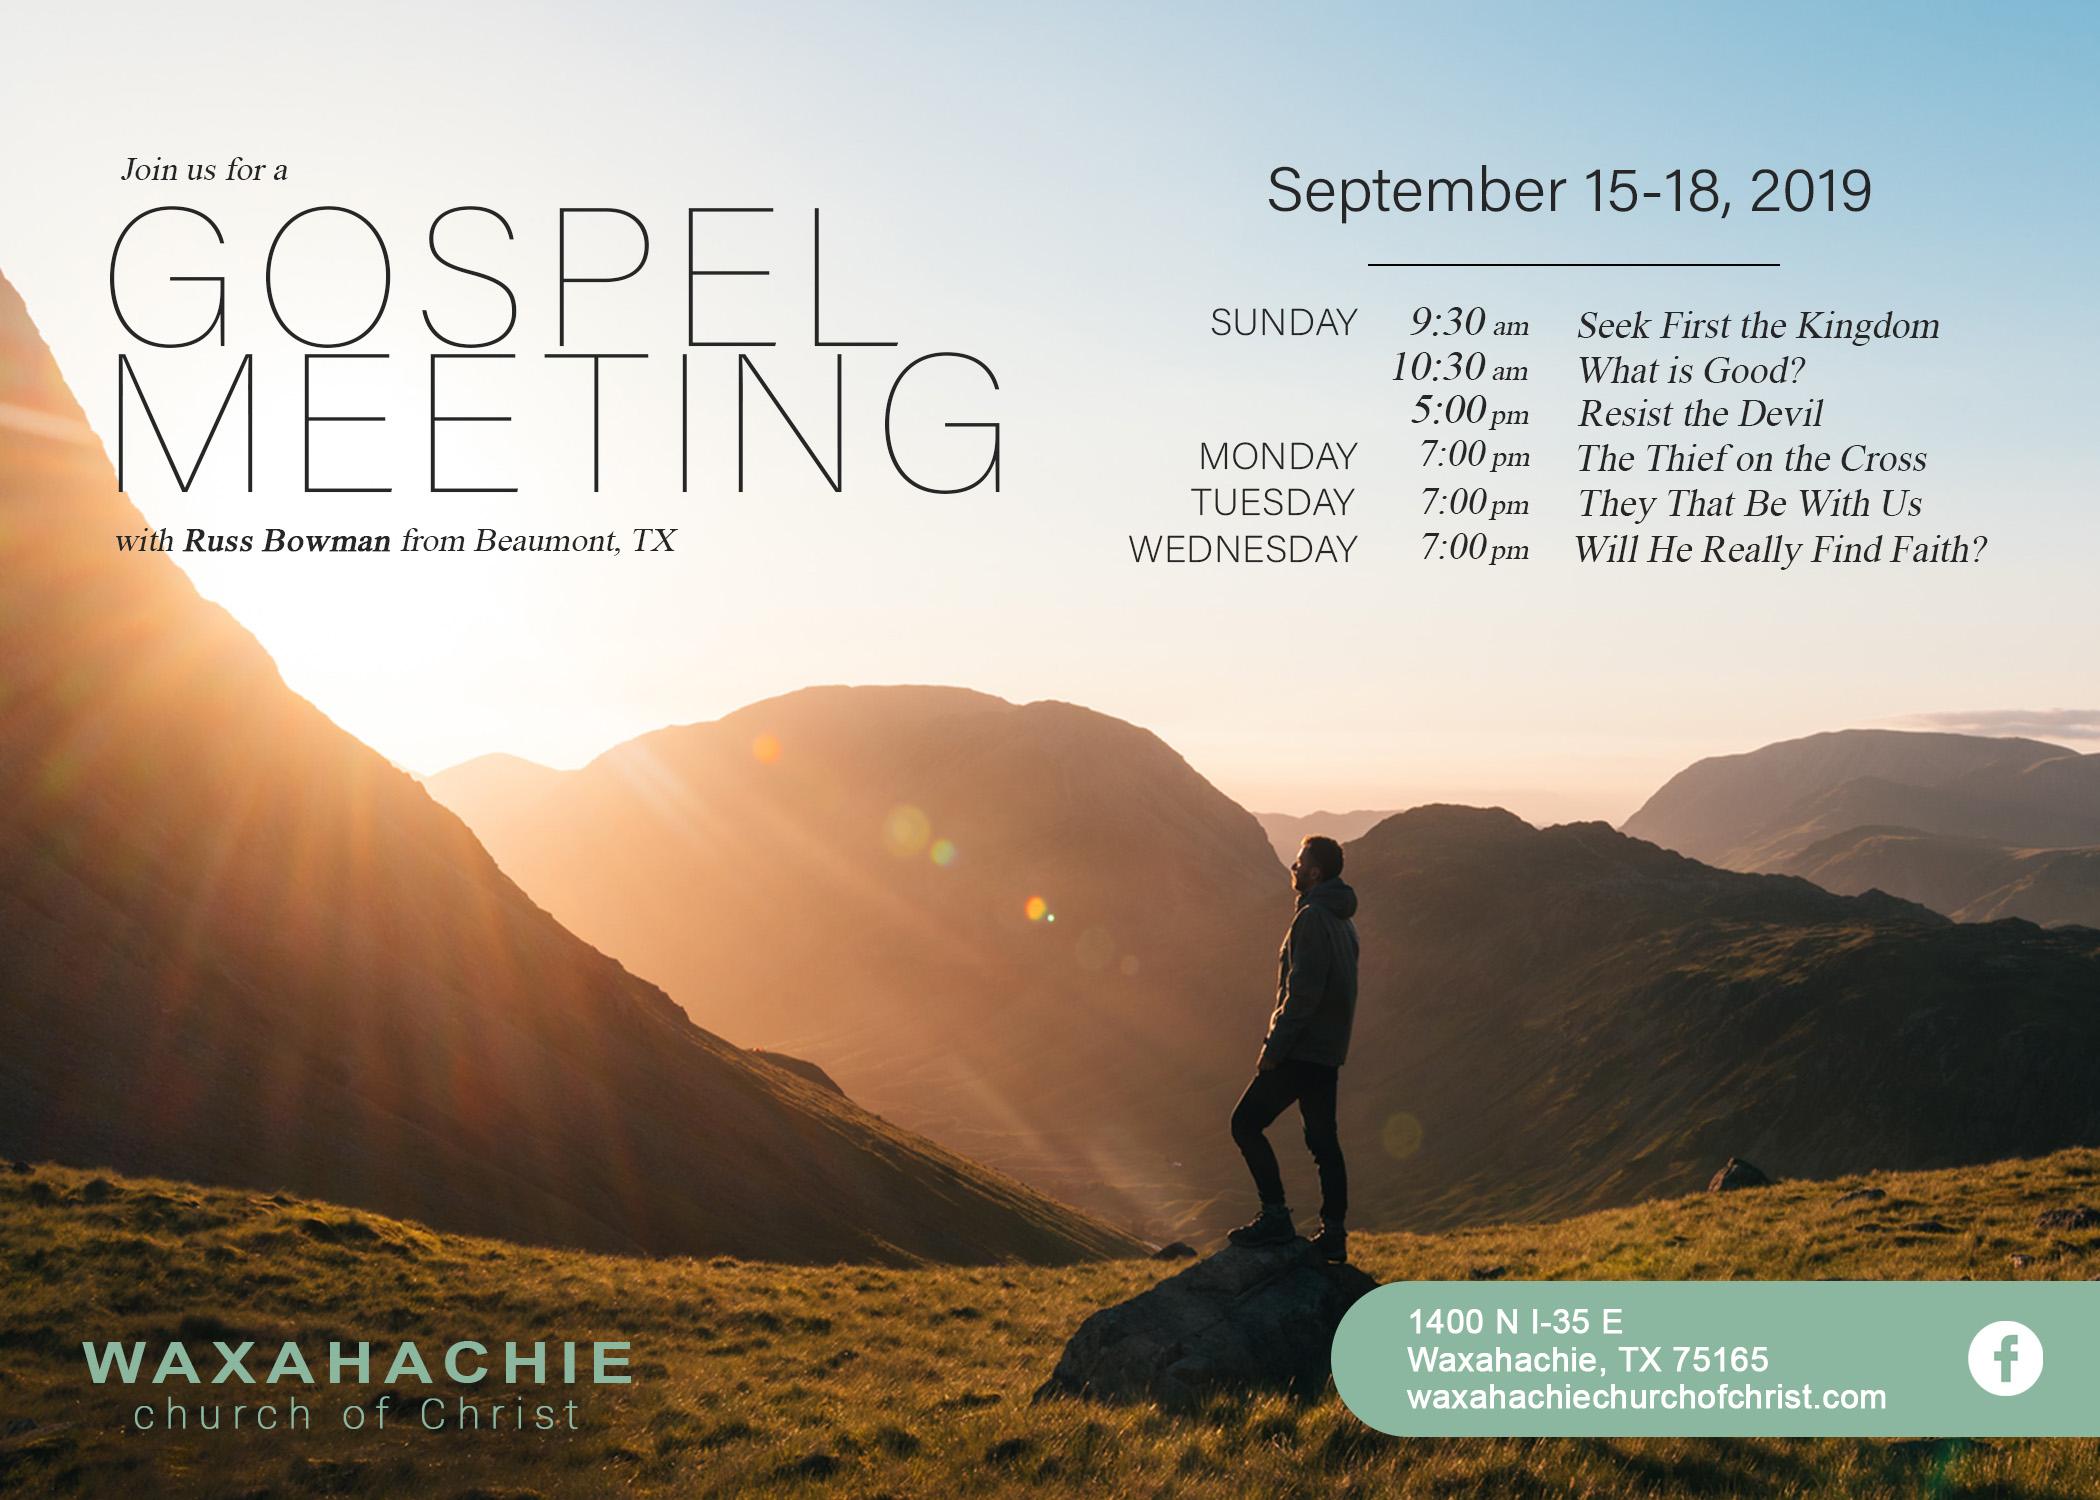 waxahachie church of christ gospel meeting